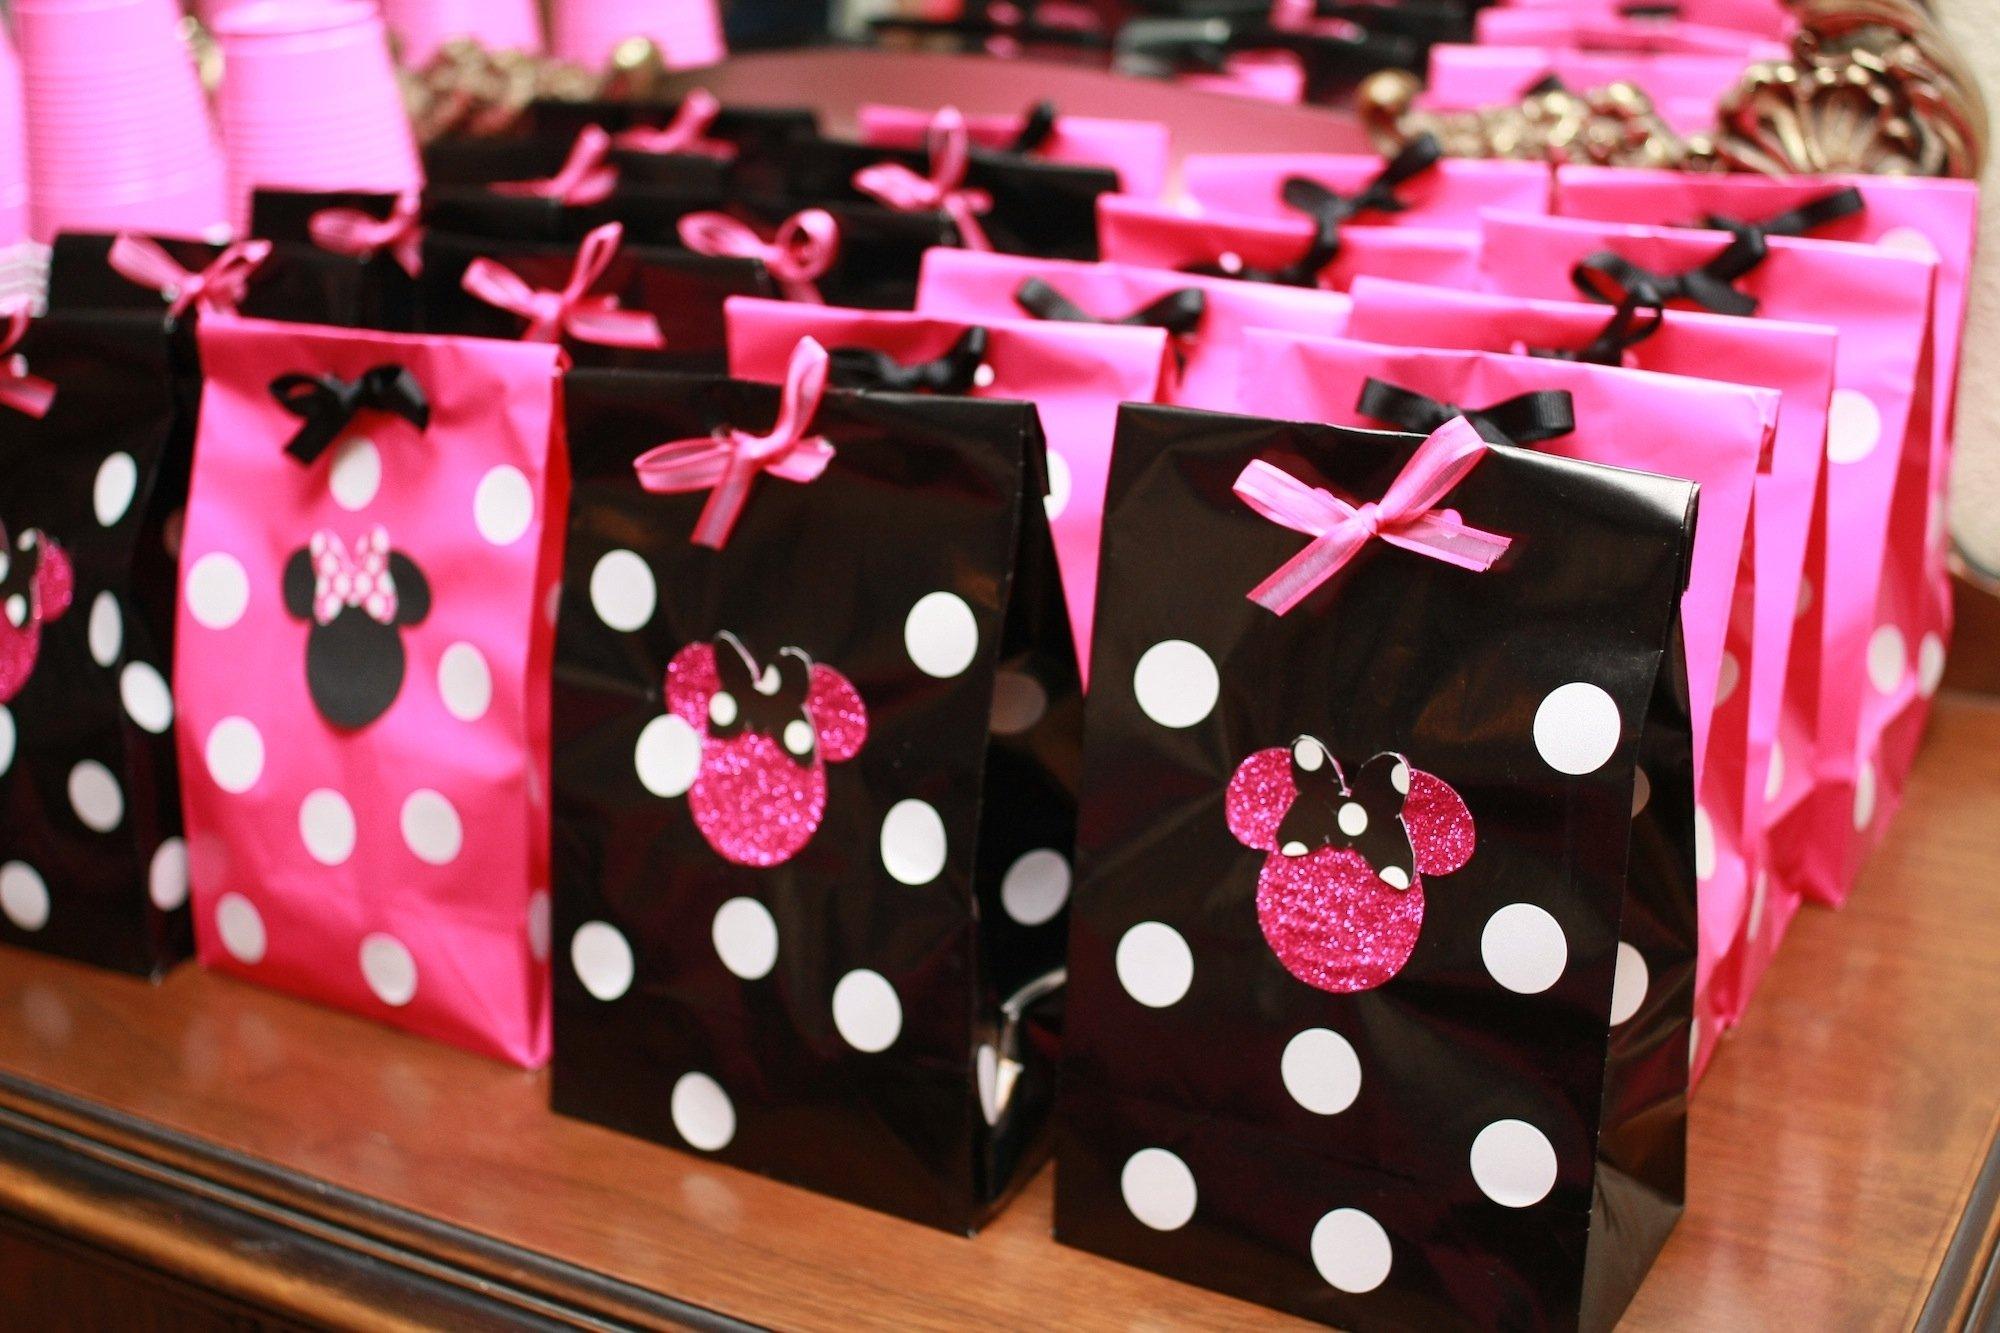 10 Fashionable Minnie Mouse First Birthday Ideas minnie mouse nicolenjoli photography 2021